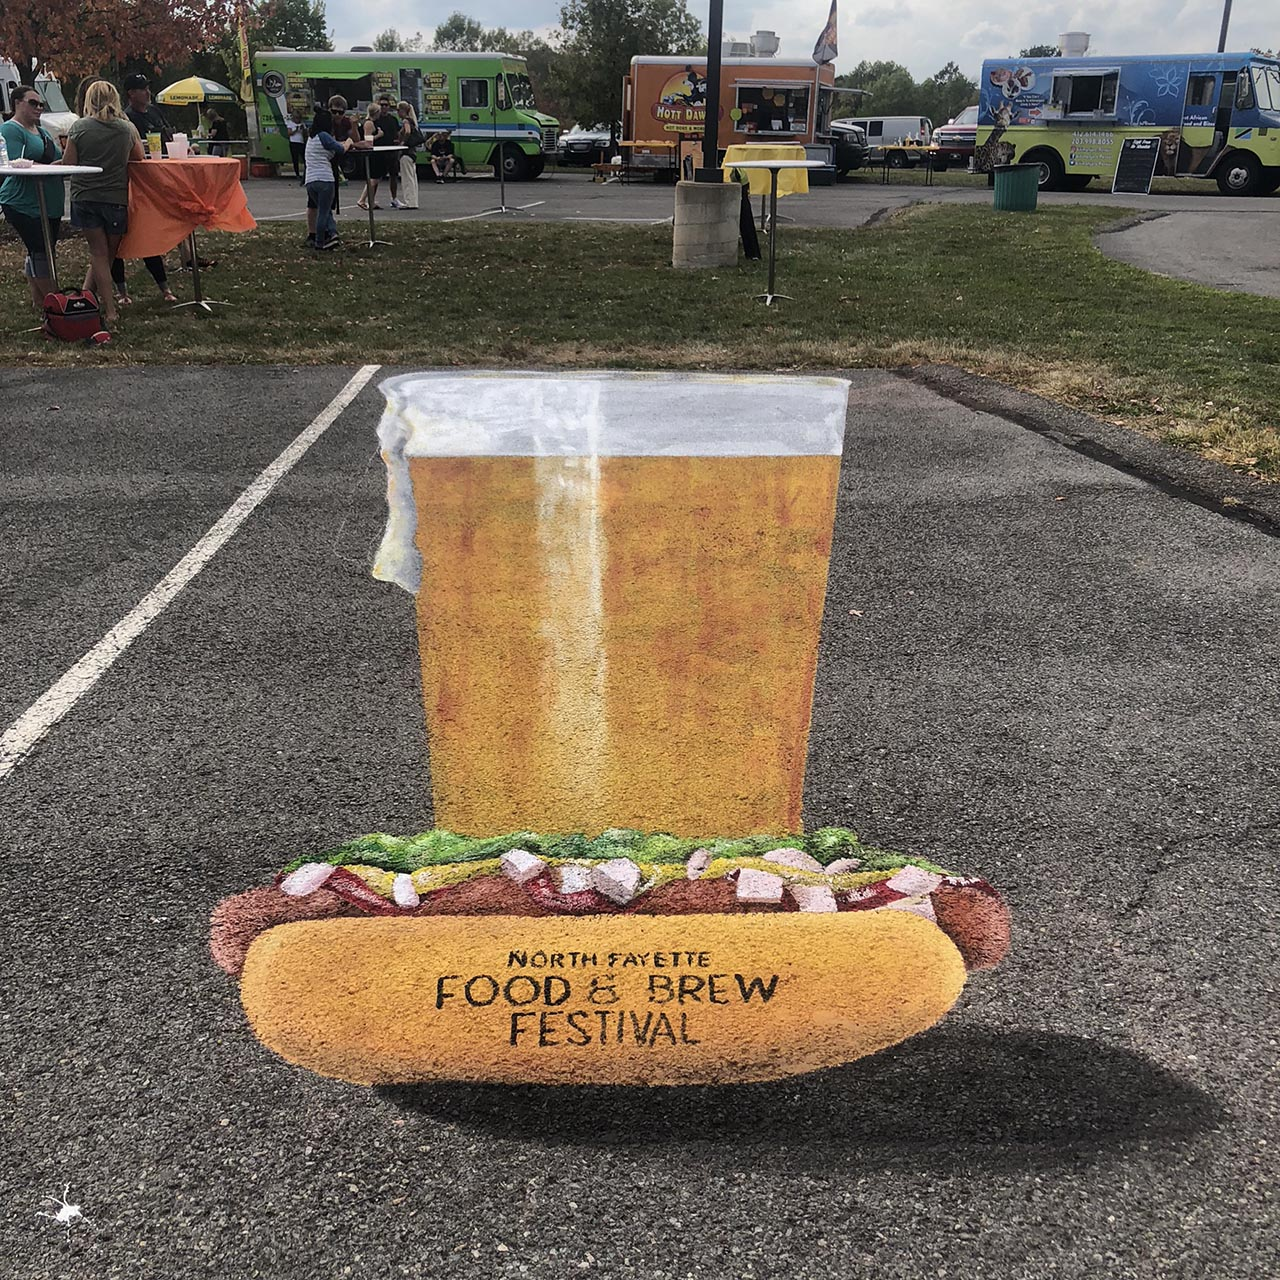 North Fayette Food & Brew Festival